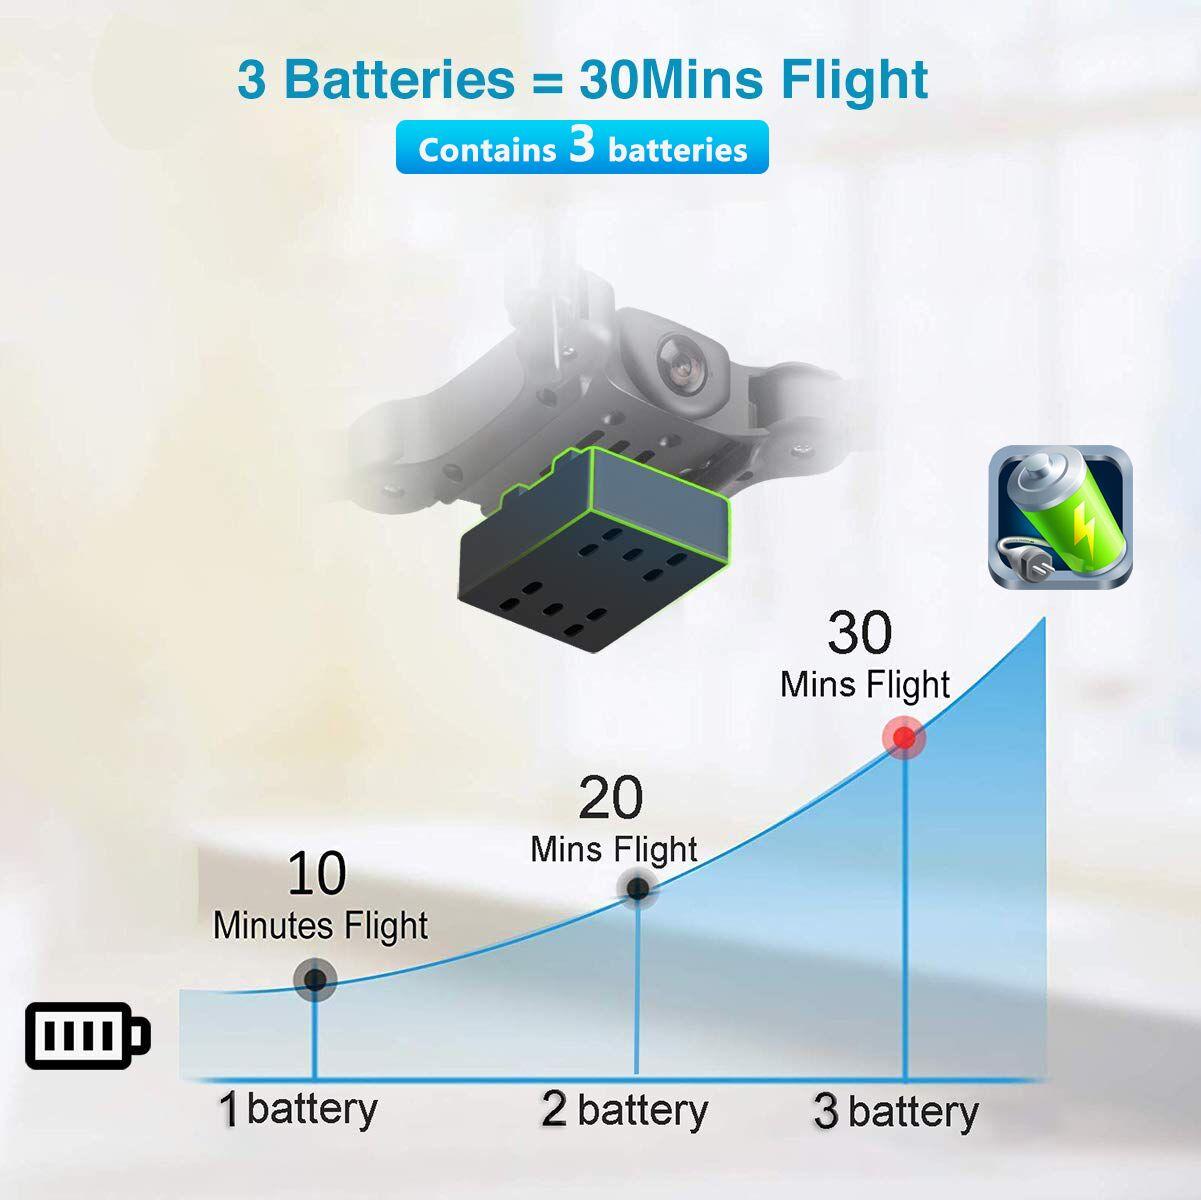 New Mini Drone V2 1080P HD Camera WiFi Fpv Air Pressure Altitude Hold Foldable Quadcopter RC Drone Kid Toy GIft 5